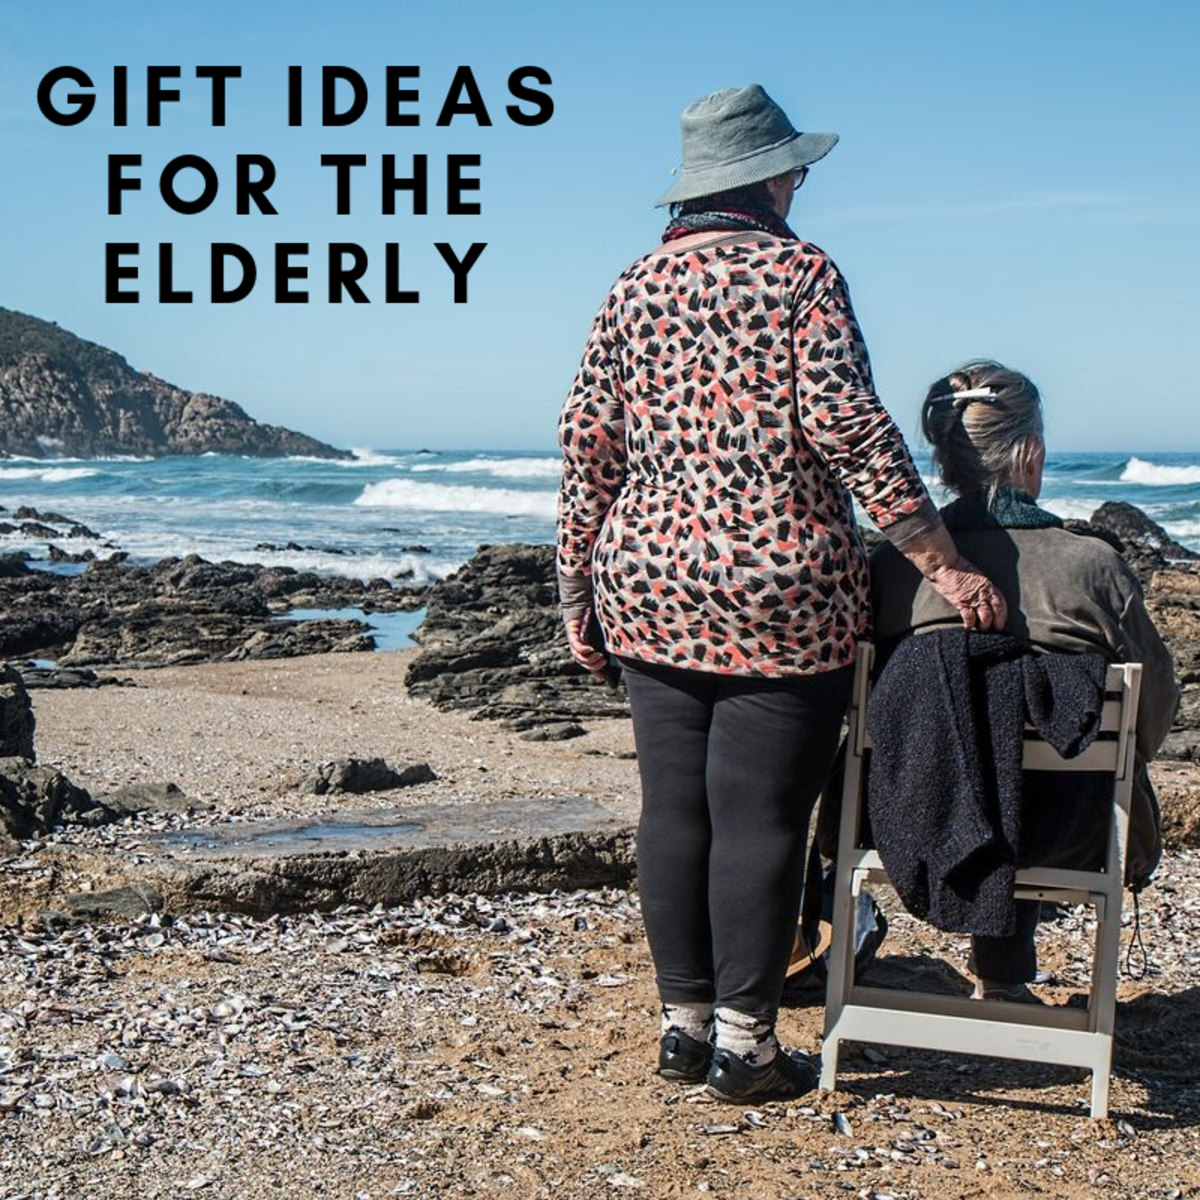 16 Best Gift Ideas for Senior Citizens and the Elderly